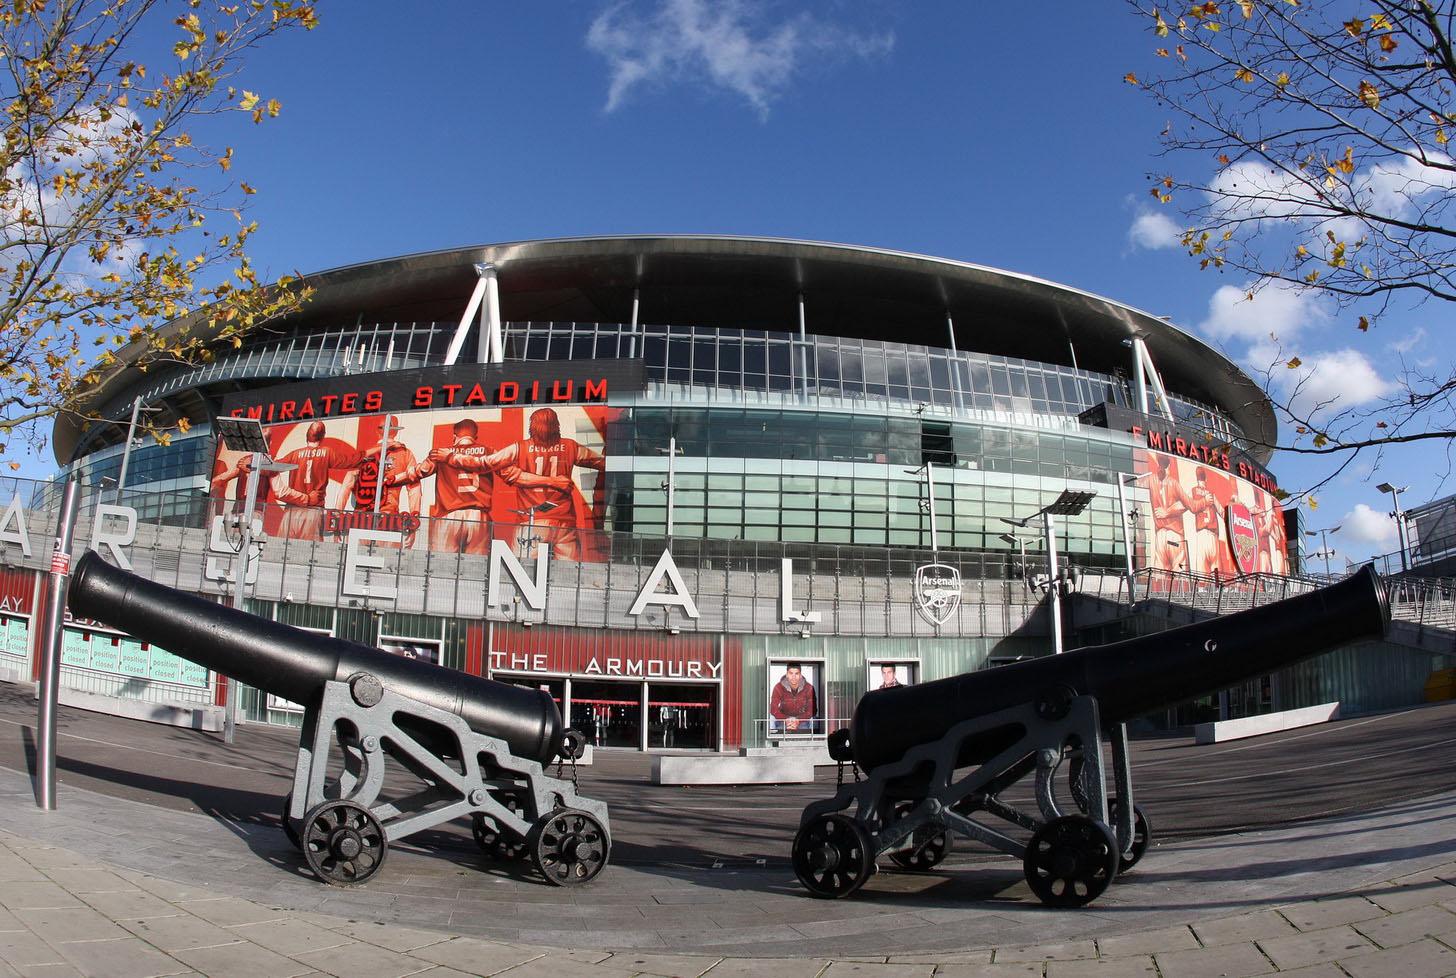 Emirates Stadium, 17/11/09. Credit : Arsenal Football Club / David Price.